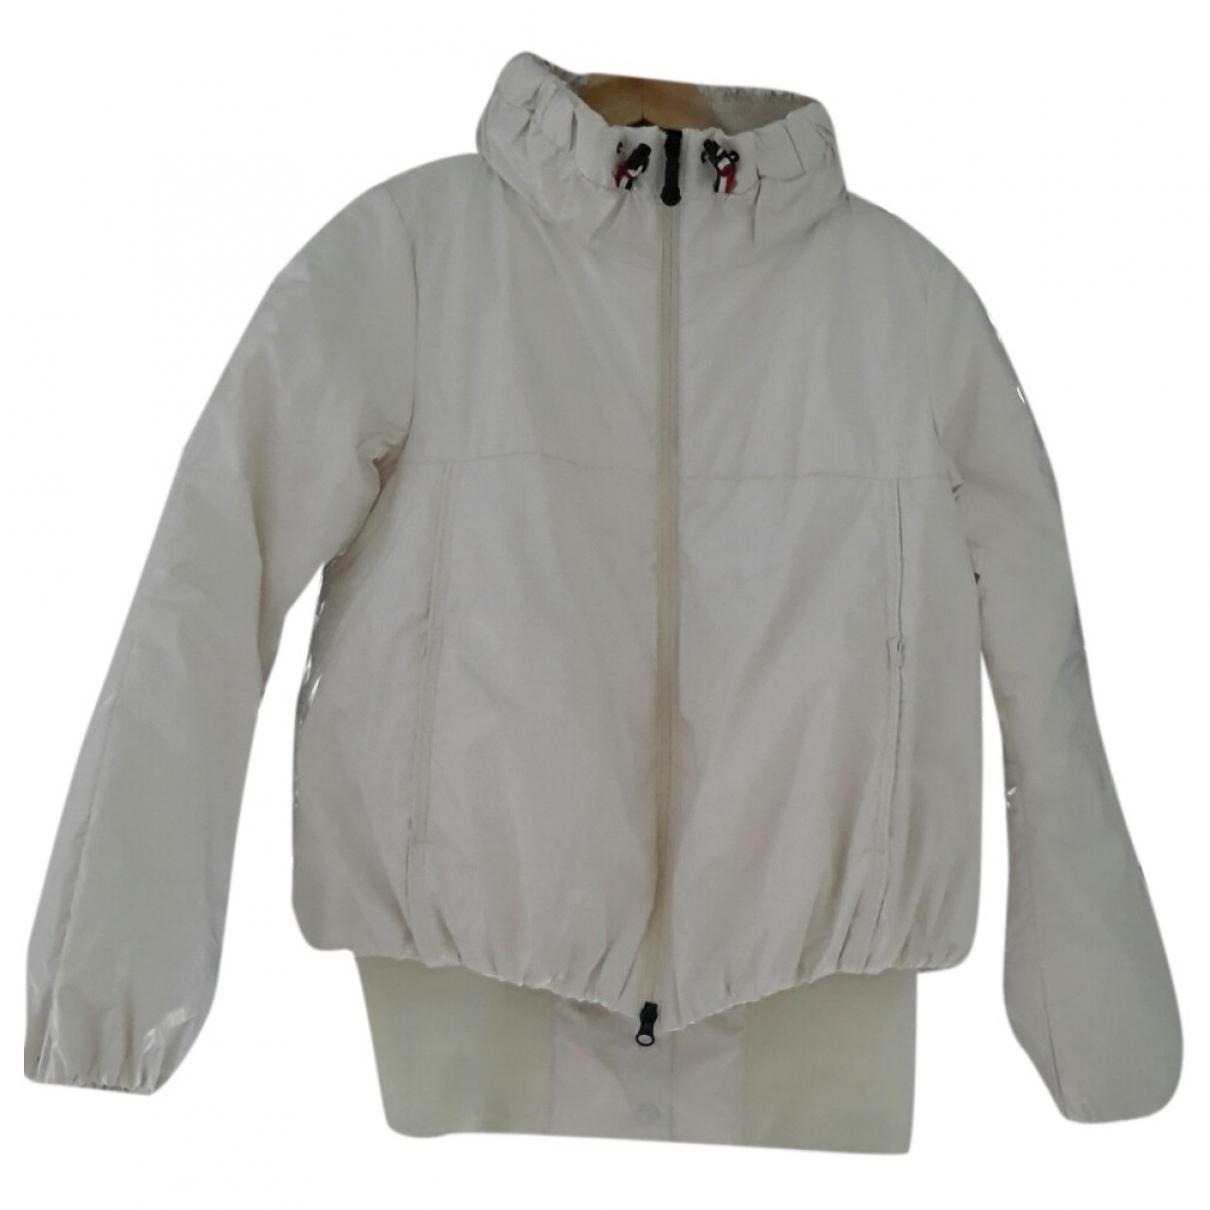 Moncler \N White jacket for Women XS International